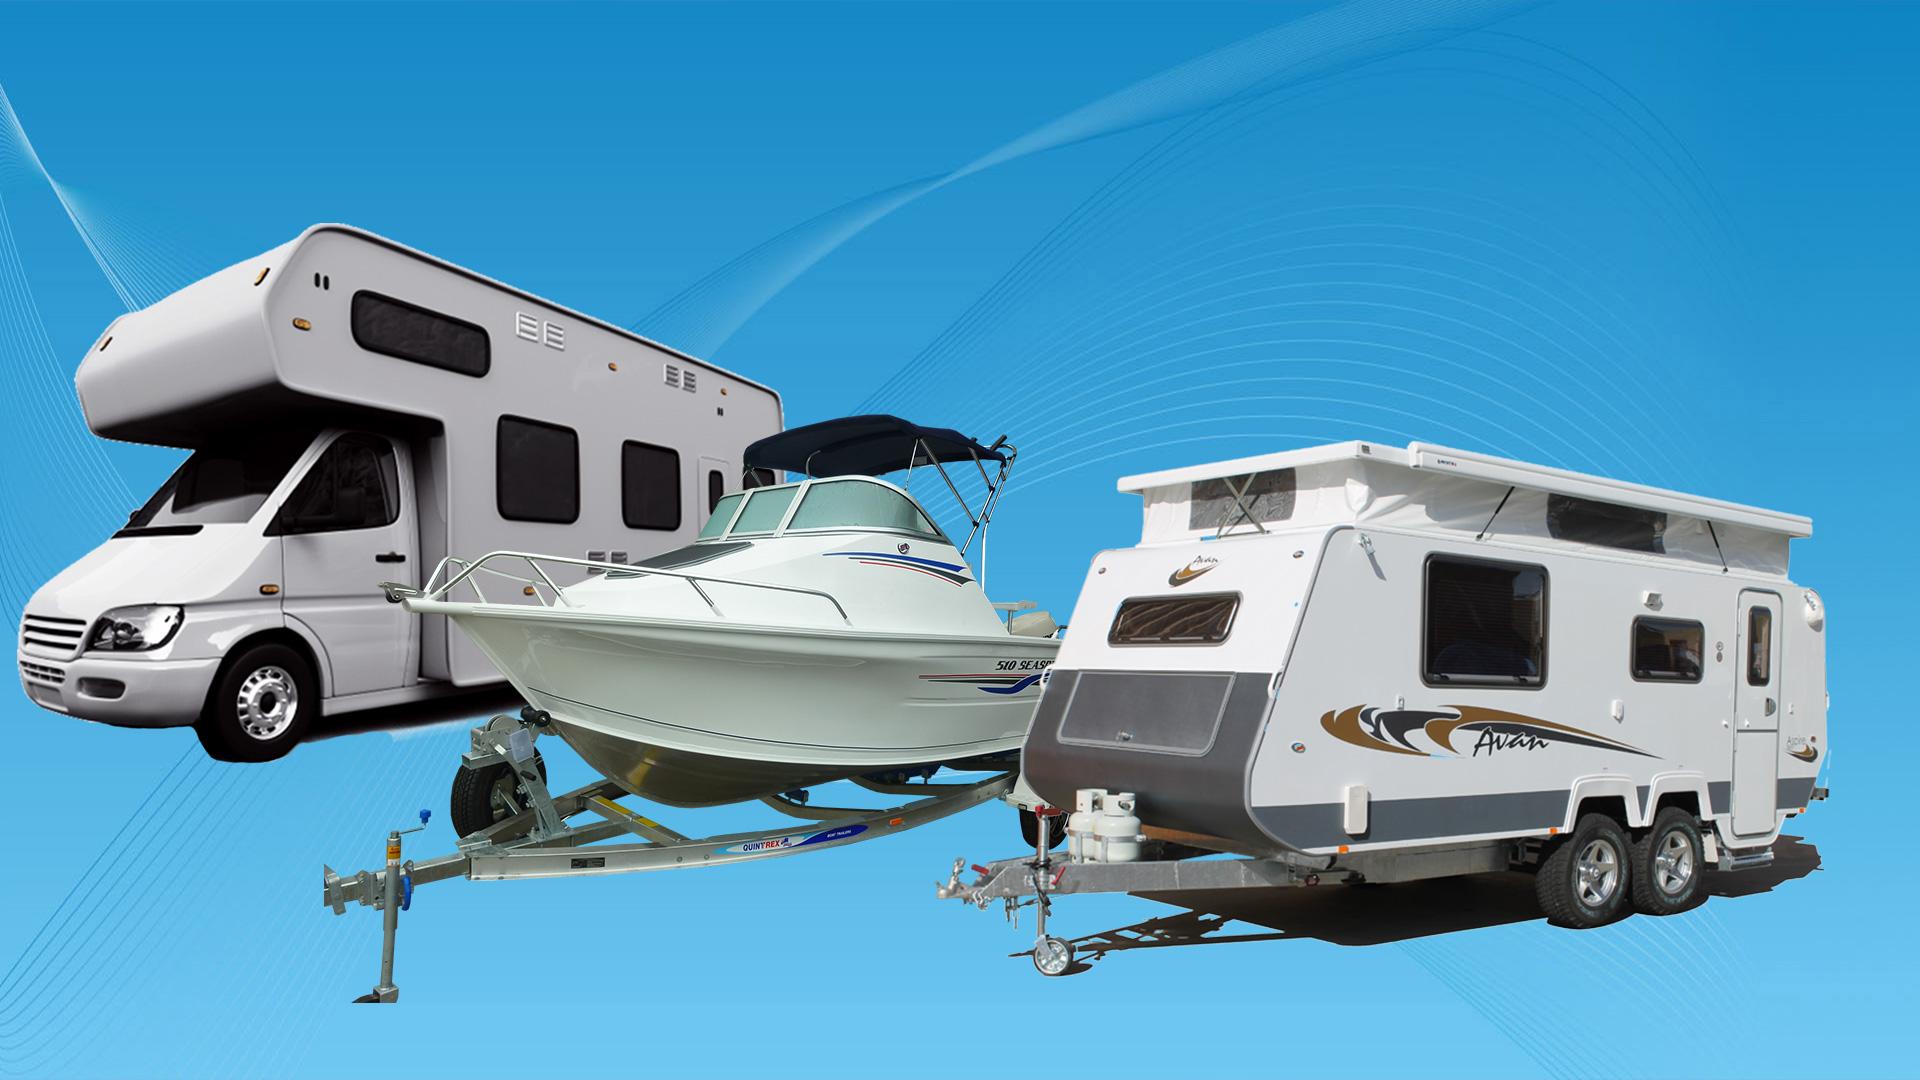 Strongroom Caravan boat Melbourne